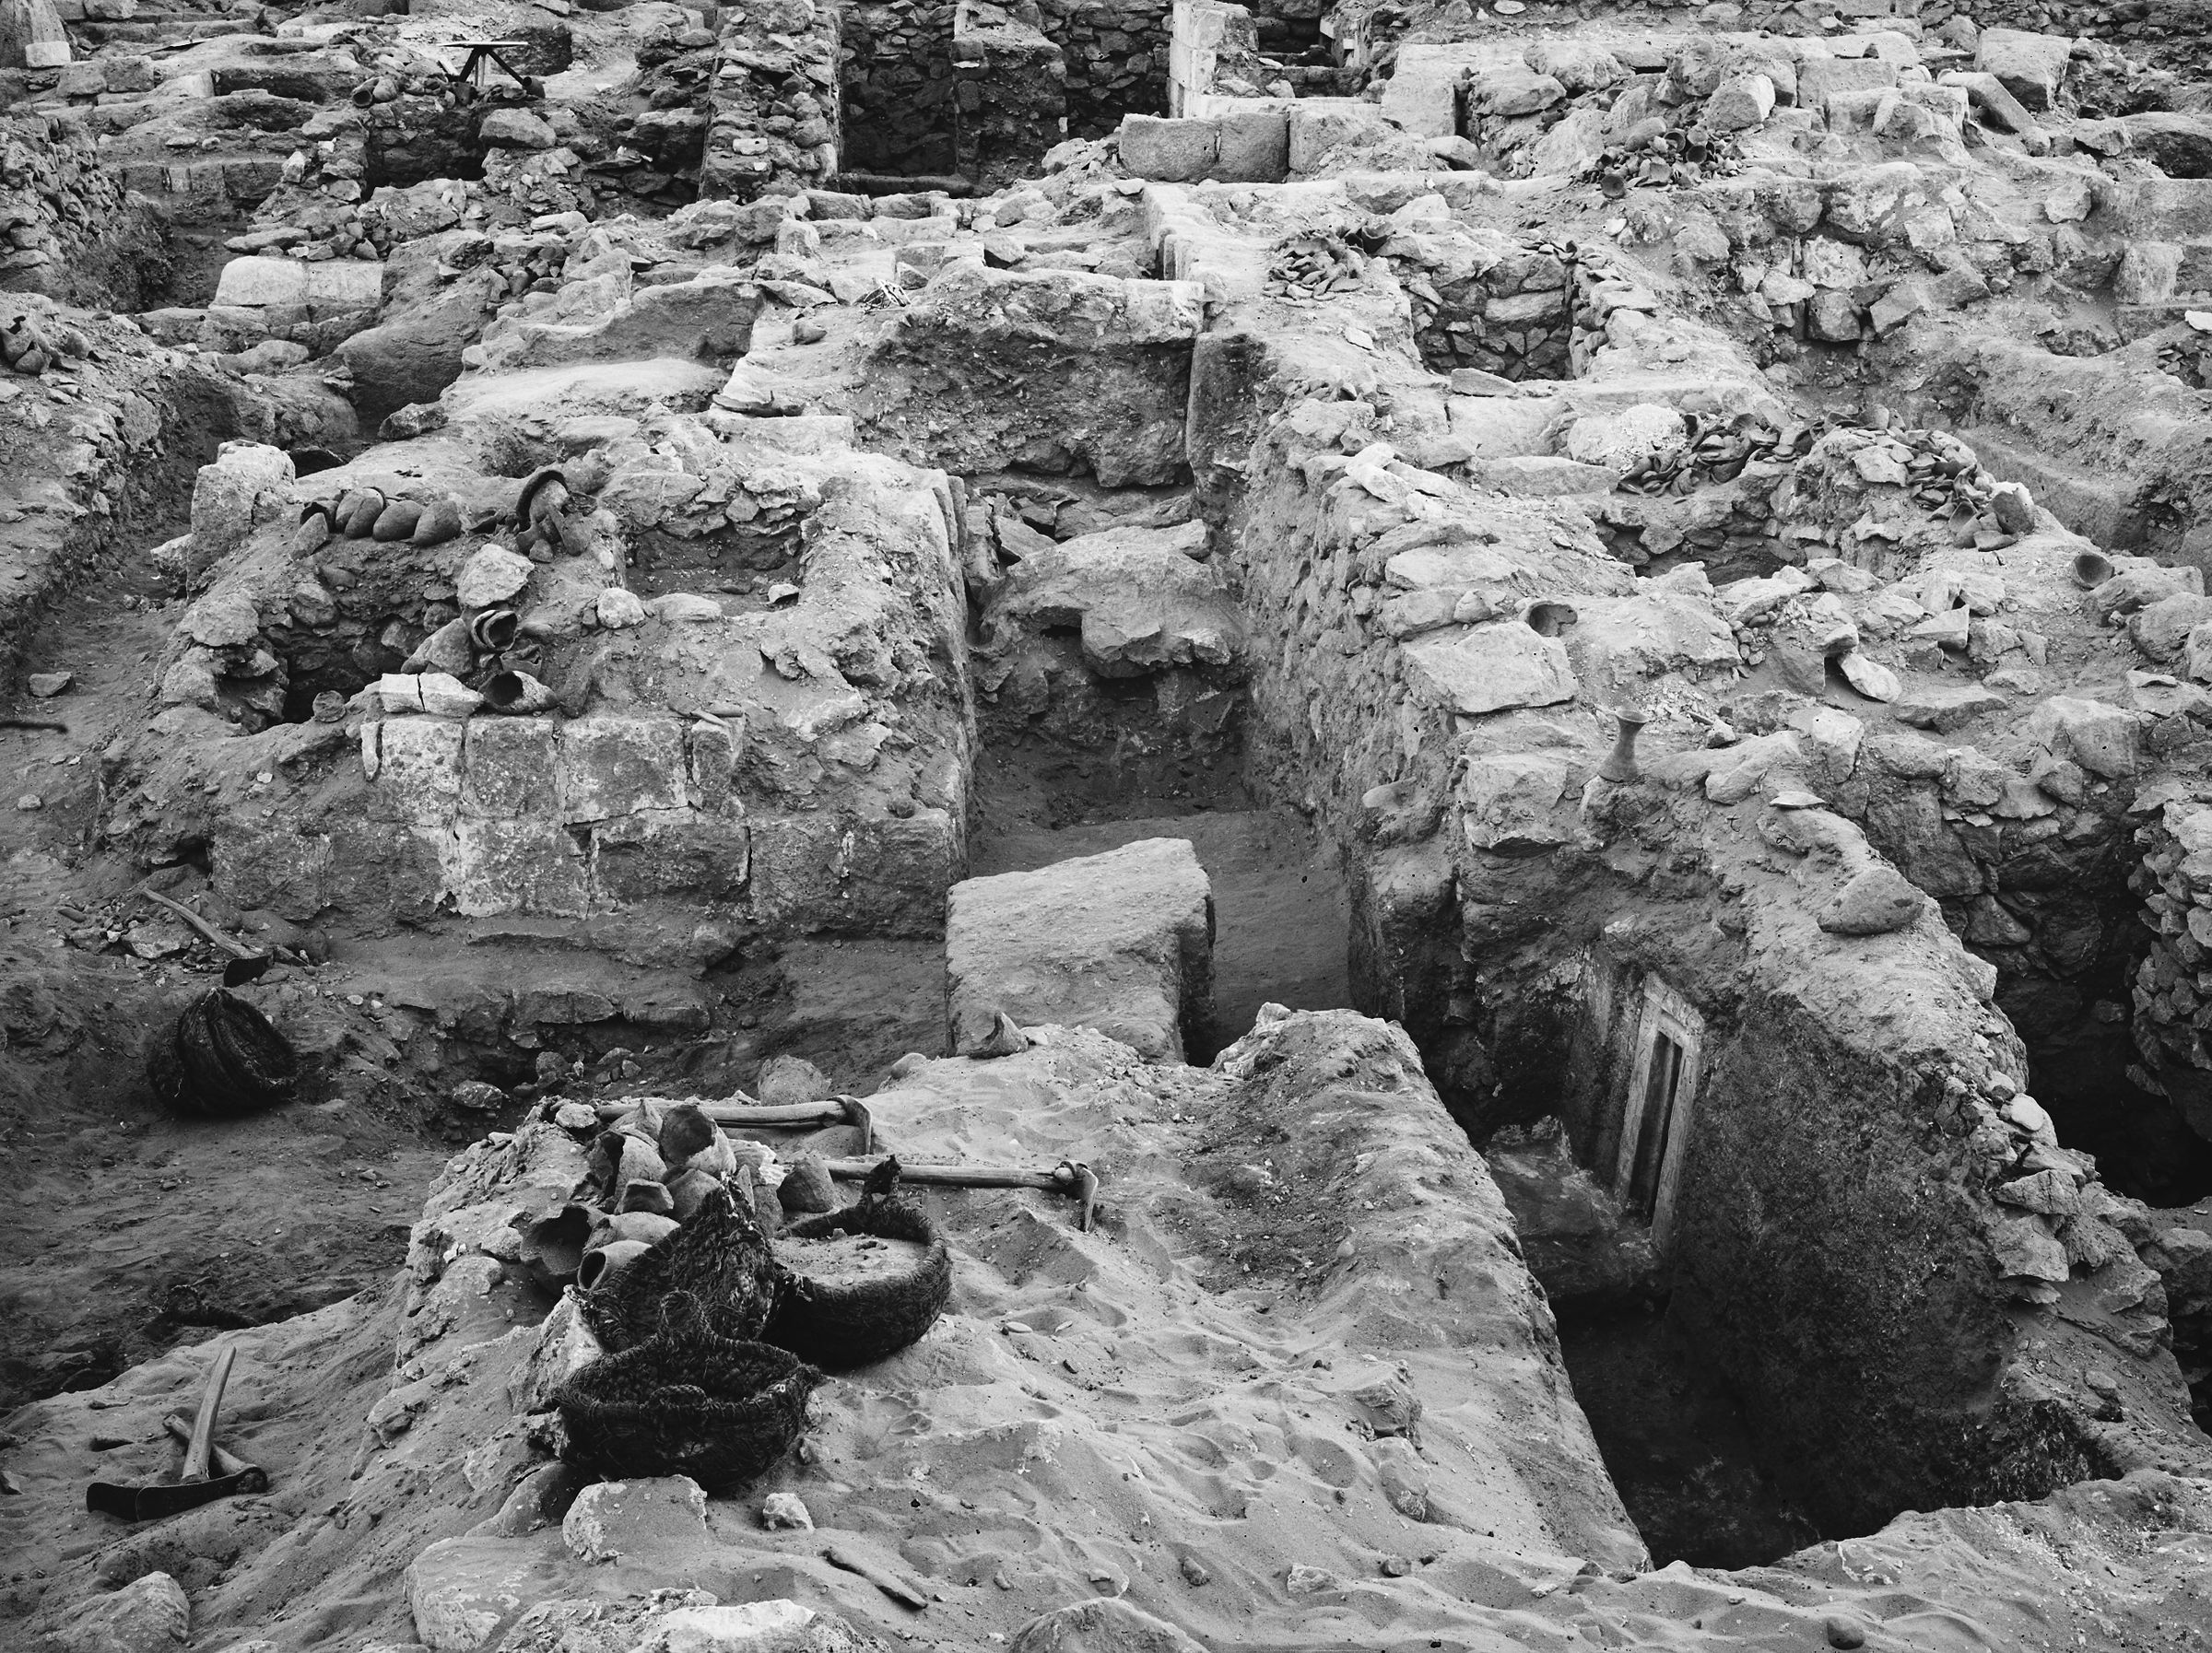 Western Cemetery: Site: Giza; View: G 1123, G 1122, G 1077, G 1121, G 1079, G 1078, G 1072